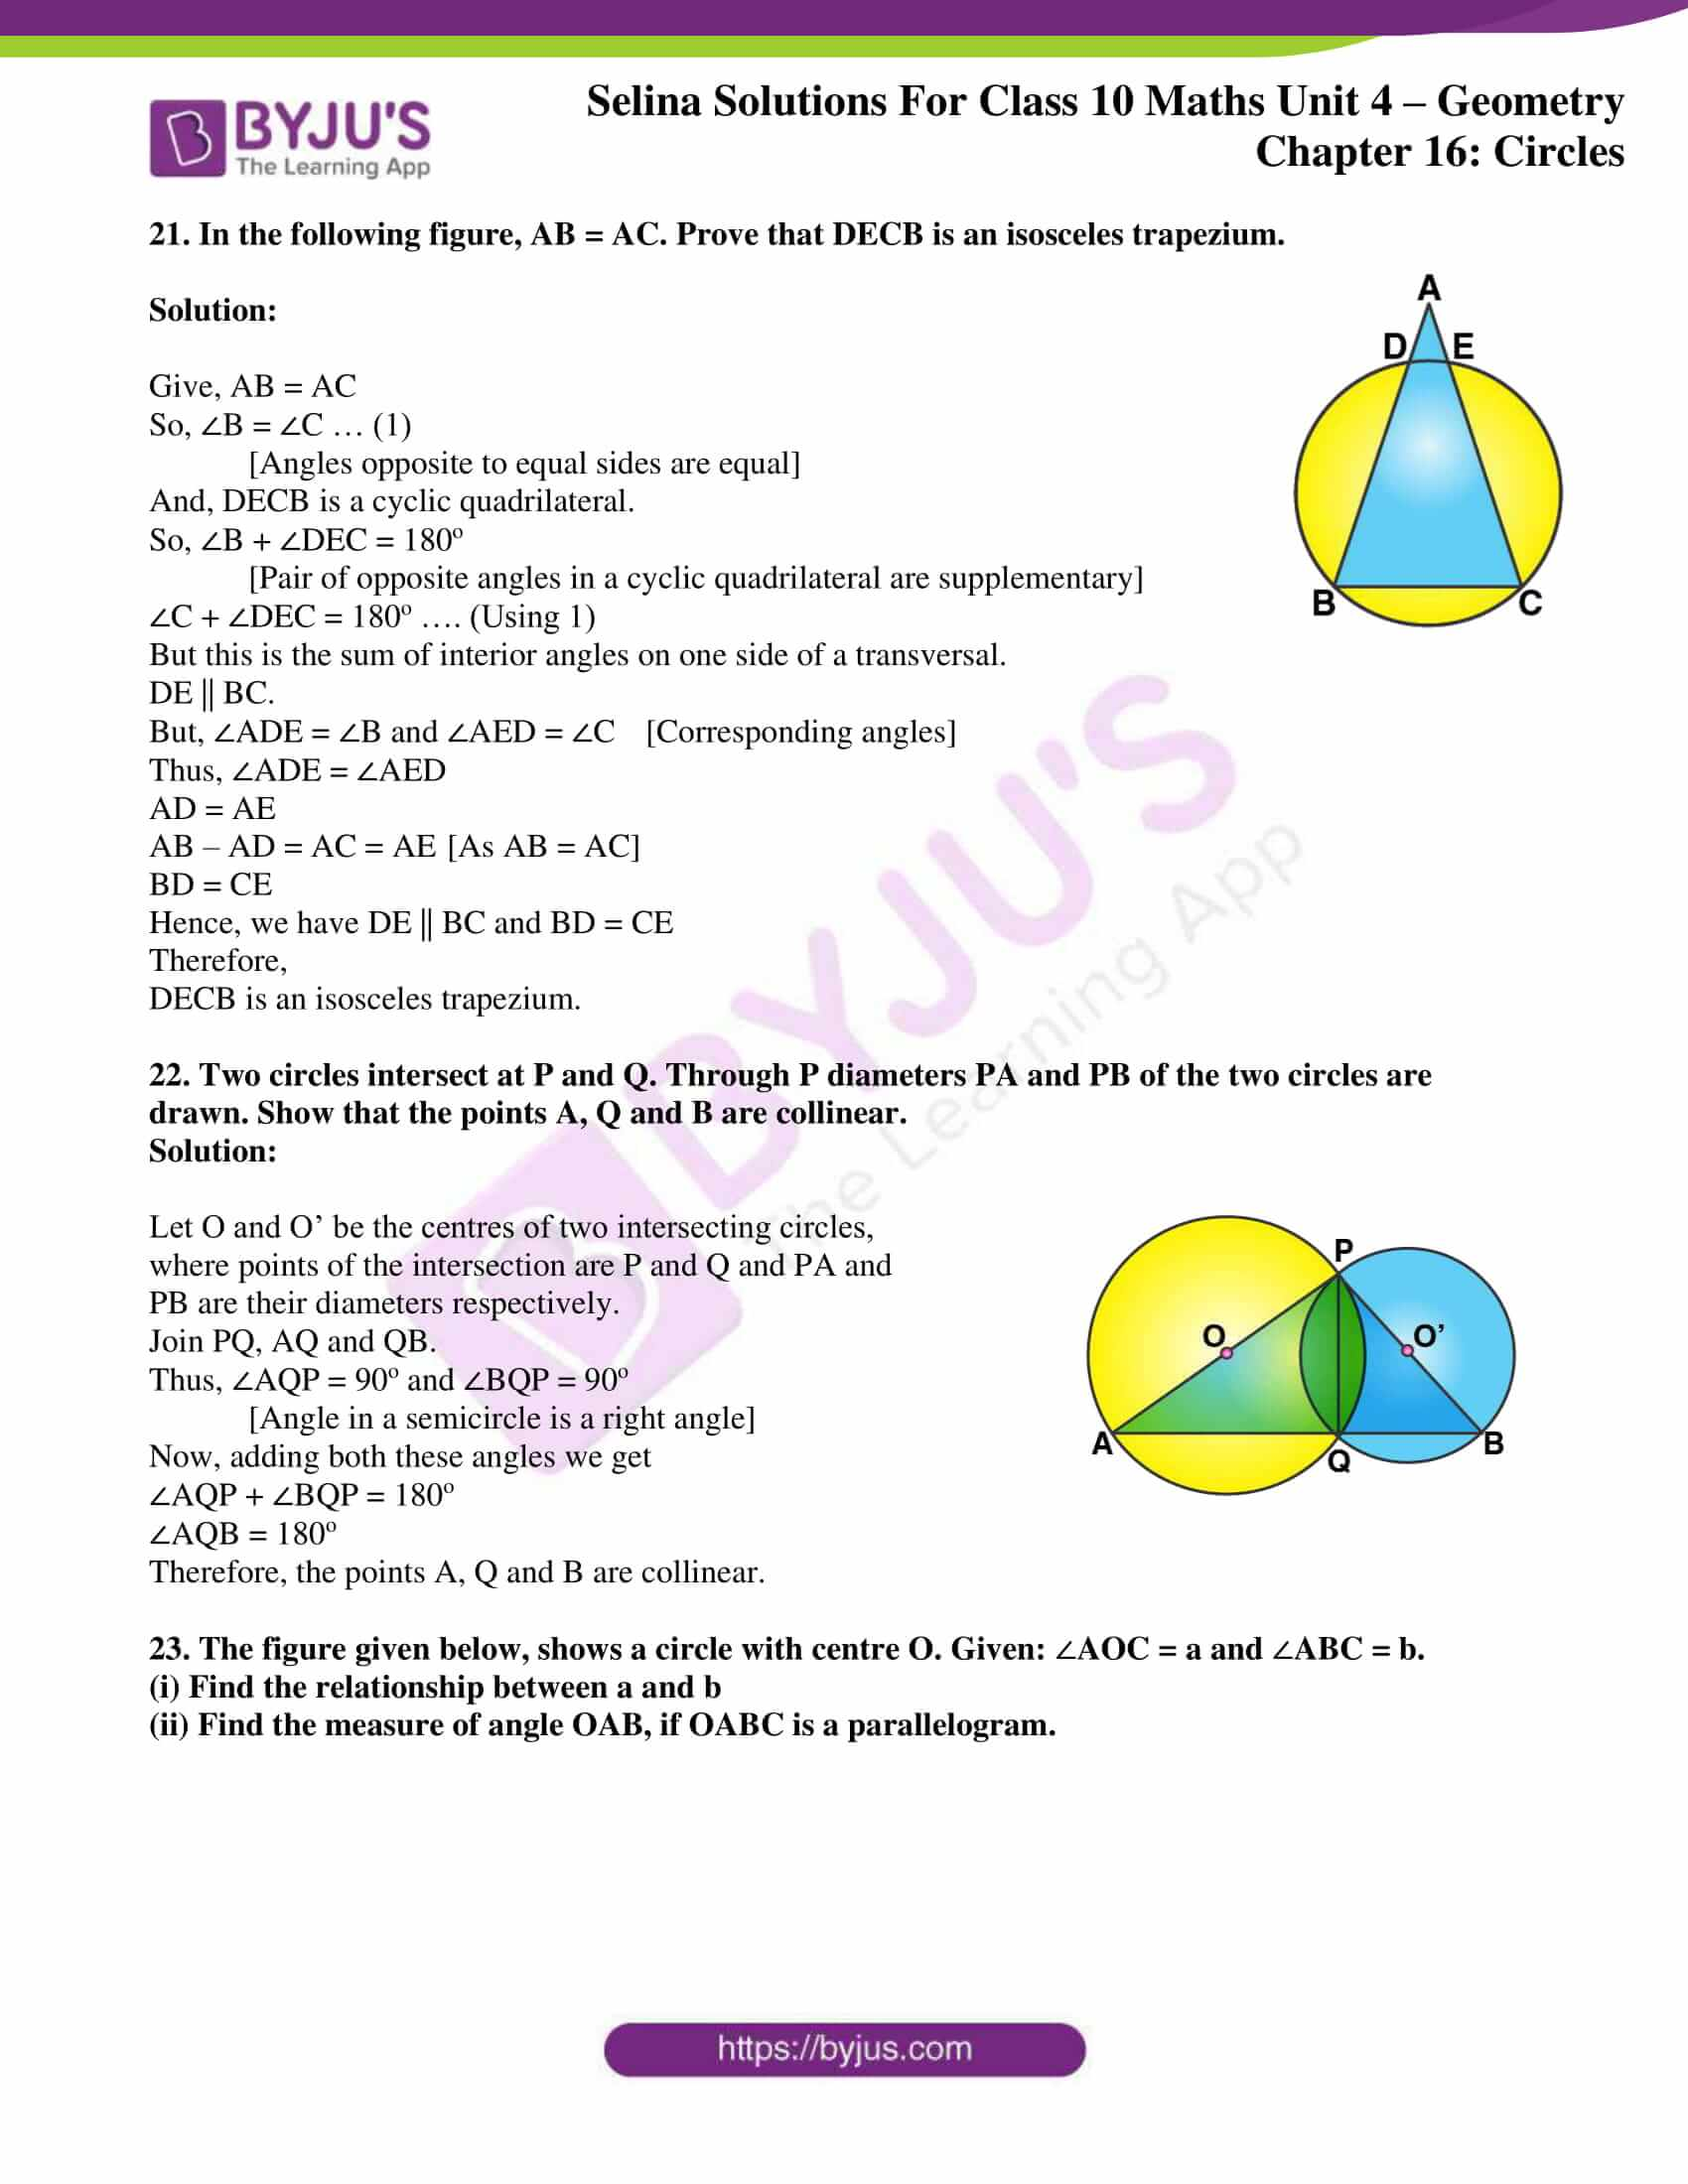 selina-sol-maths-class-10-ch-17-ex-a-12